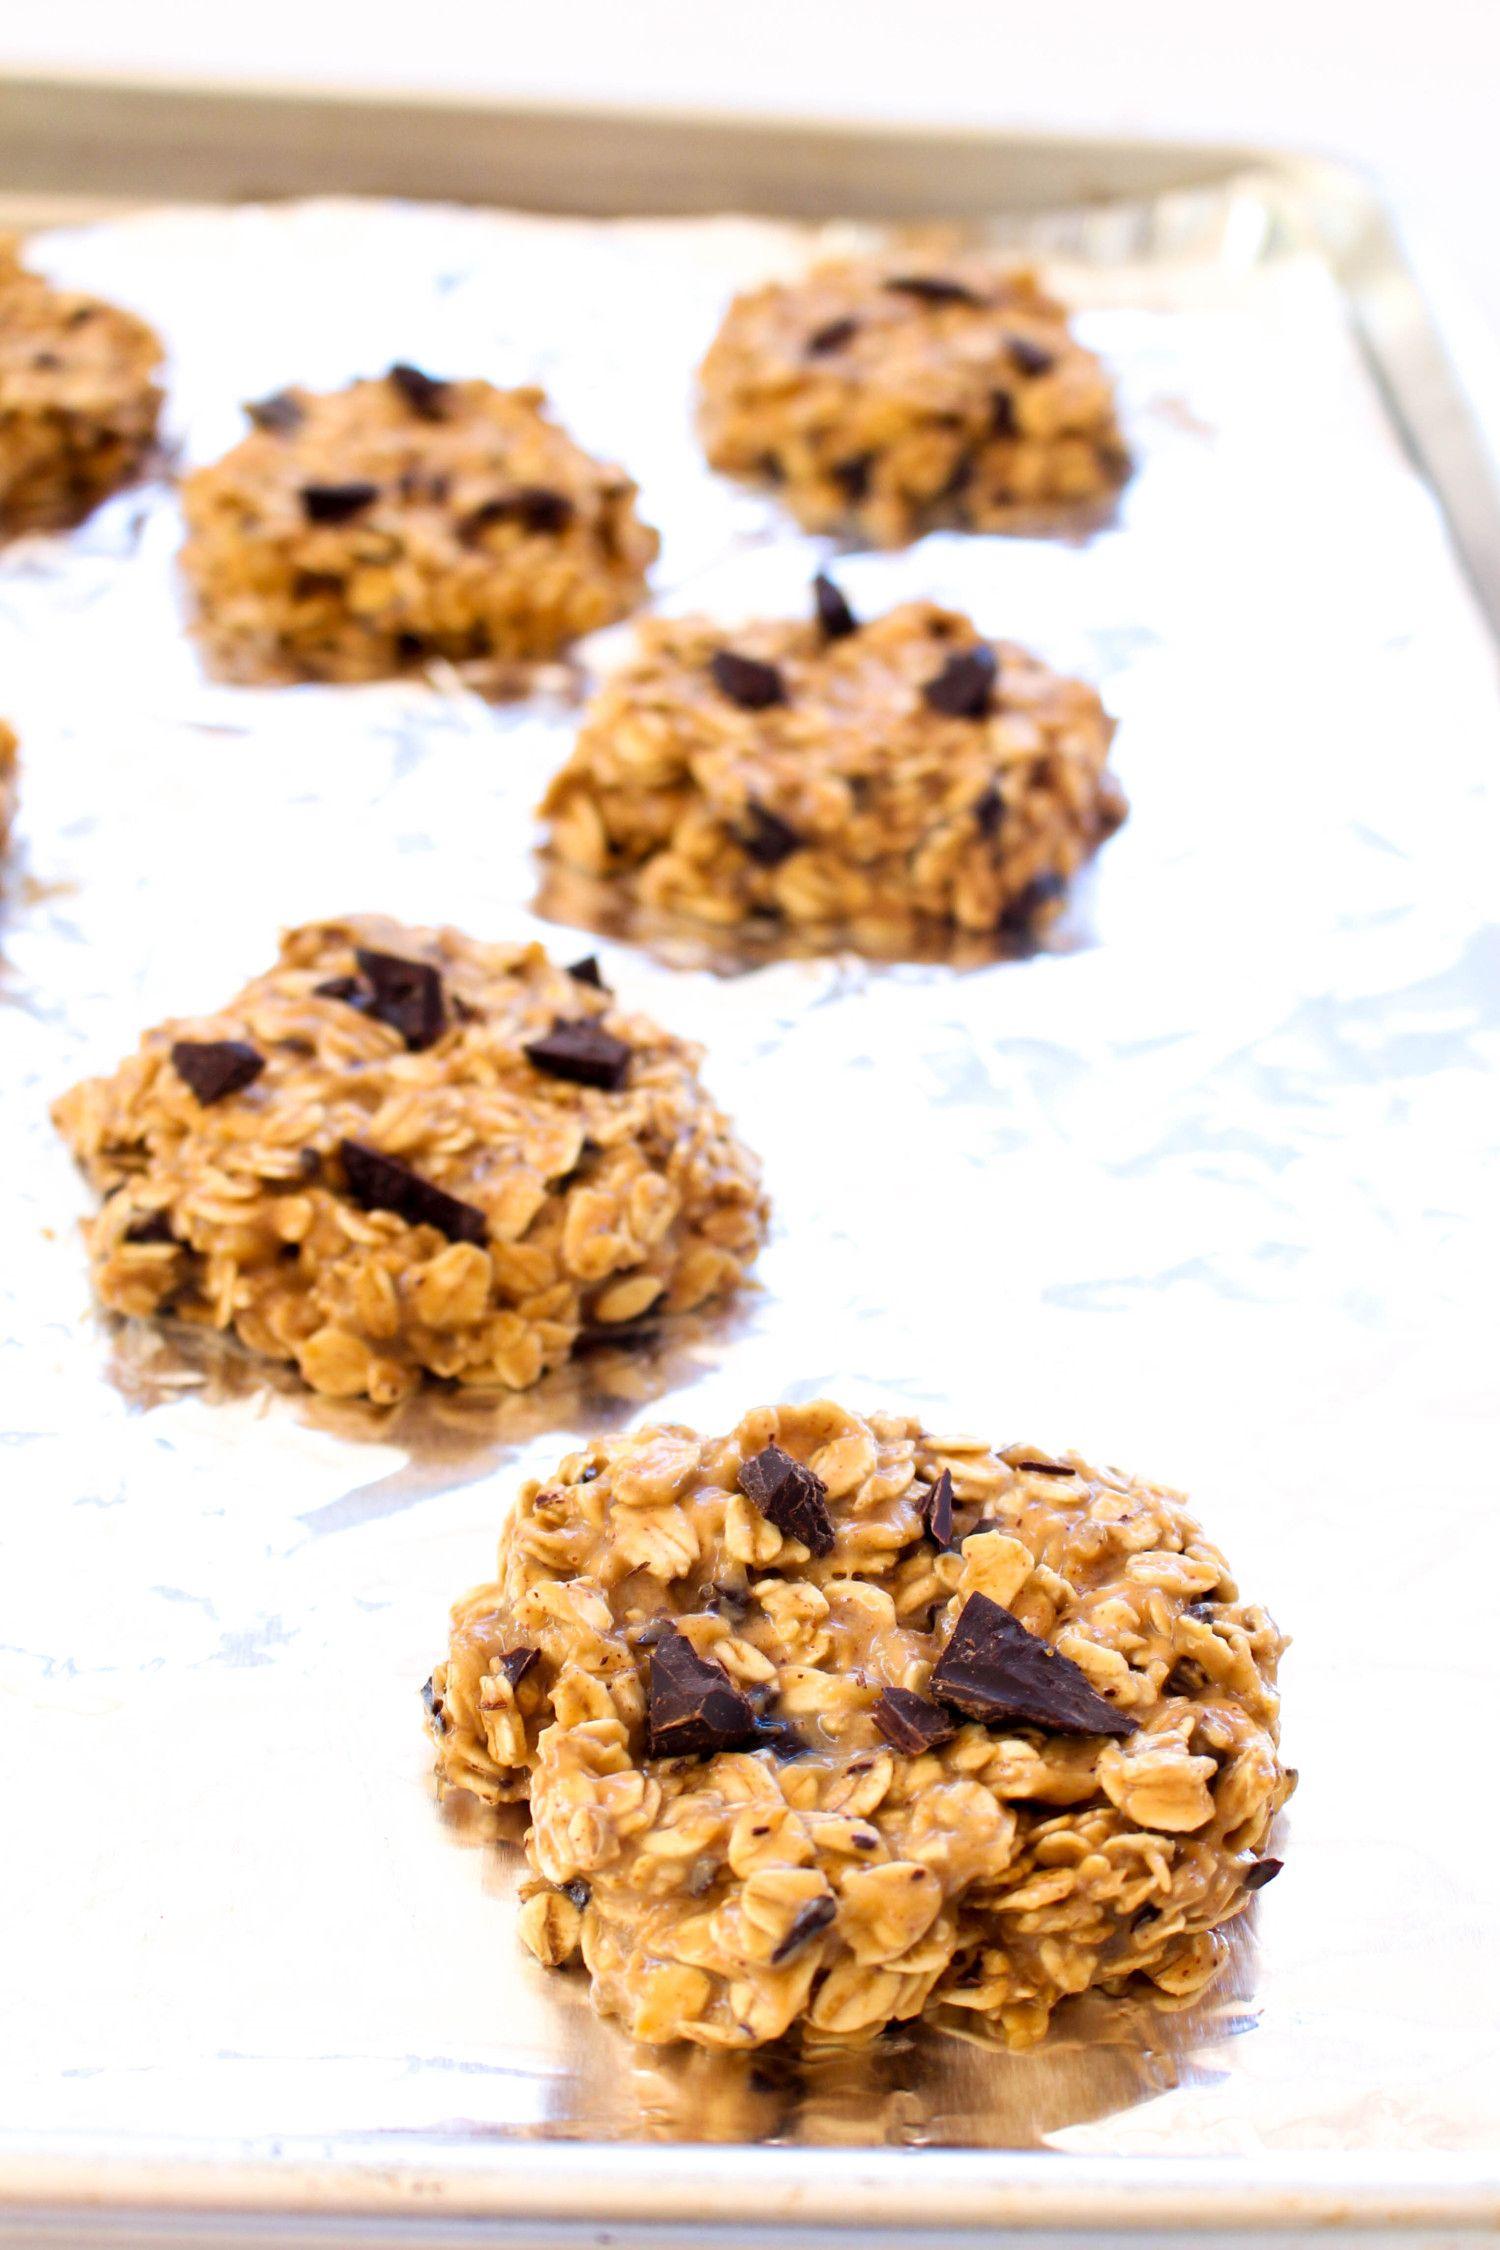 Peanut butter banana breakfast cookies bake